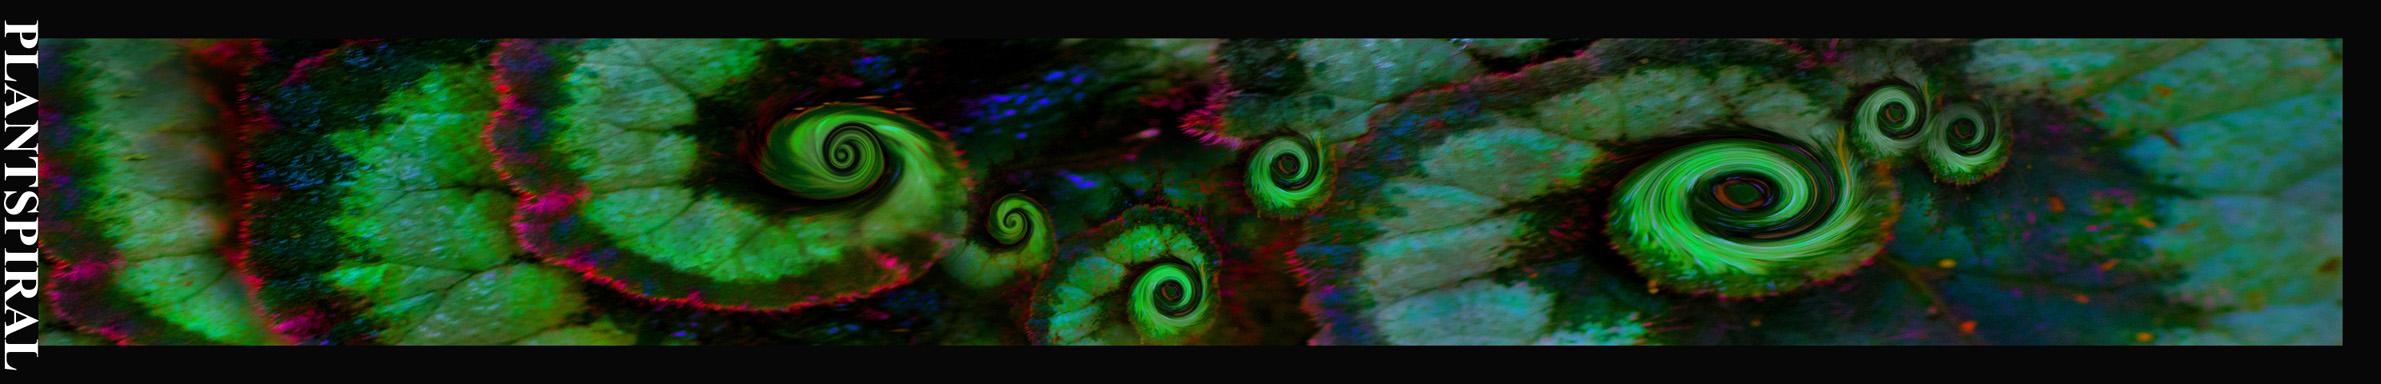 PlantSpiral IEU 8 x 60